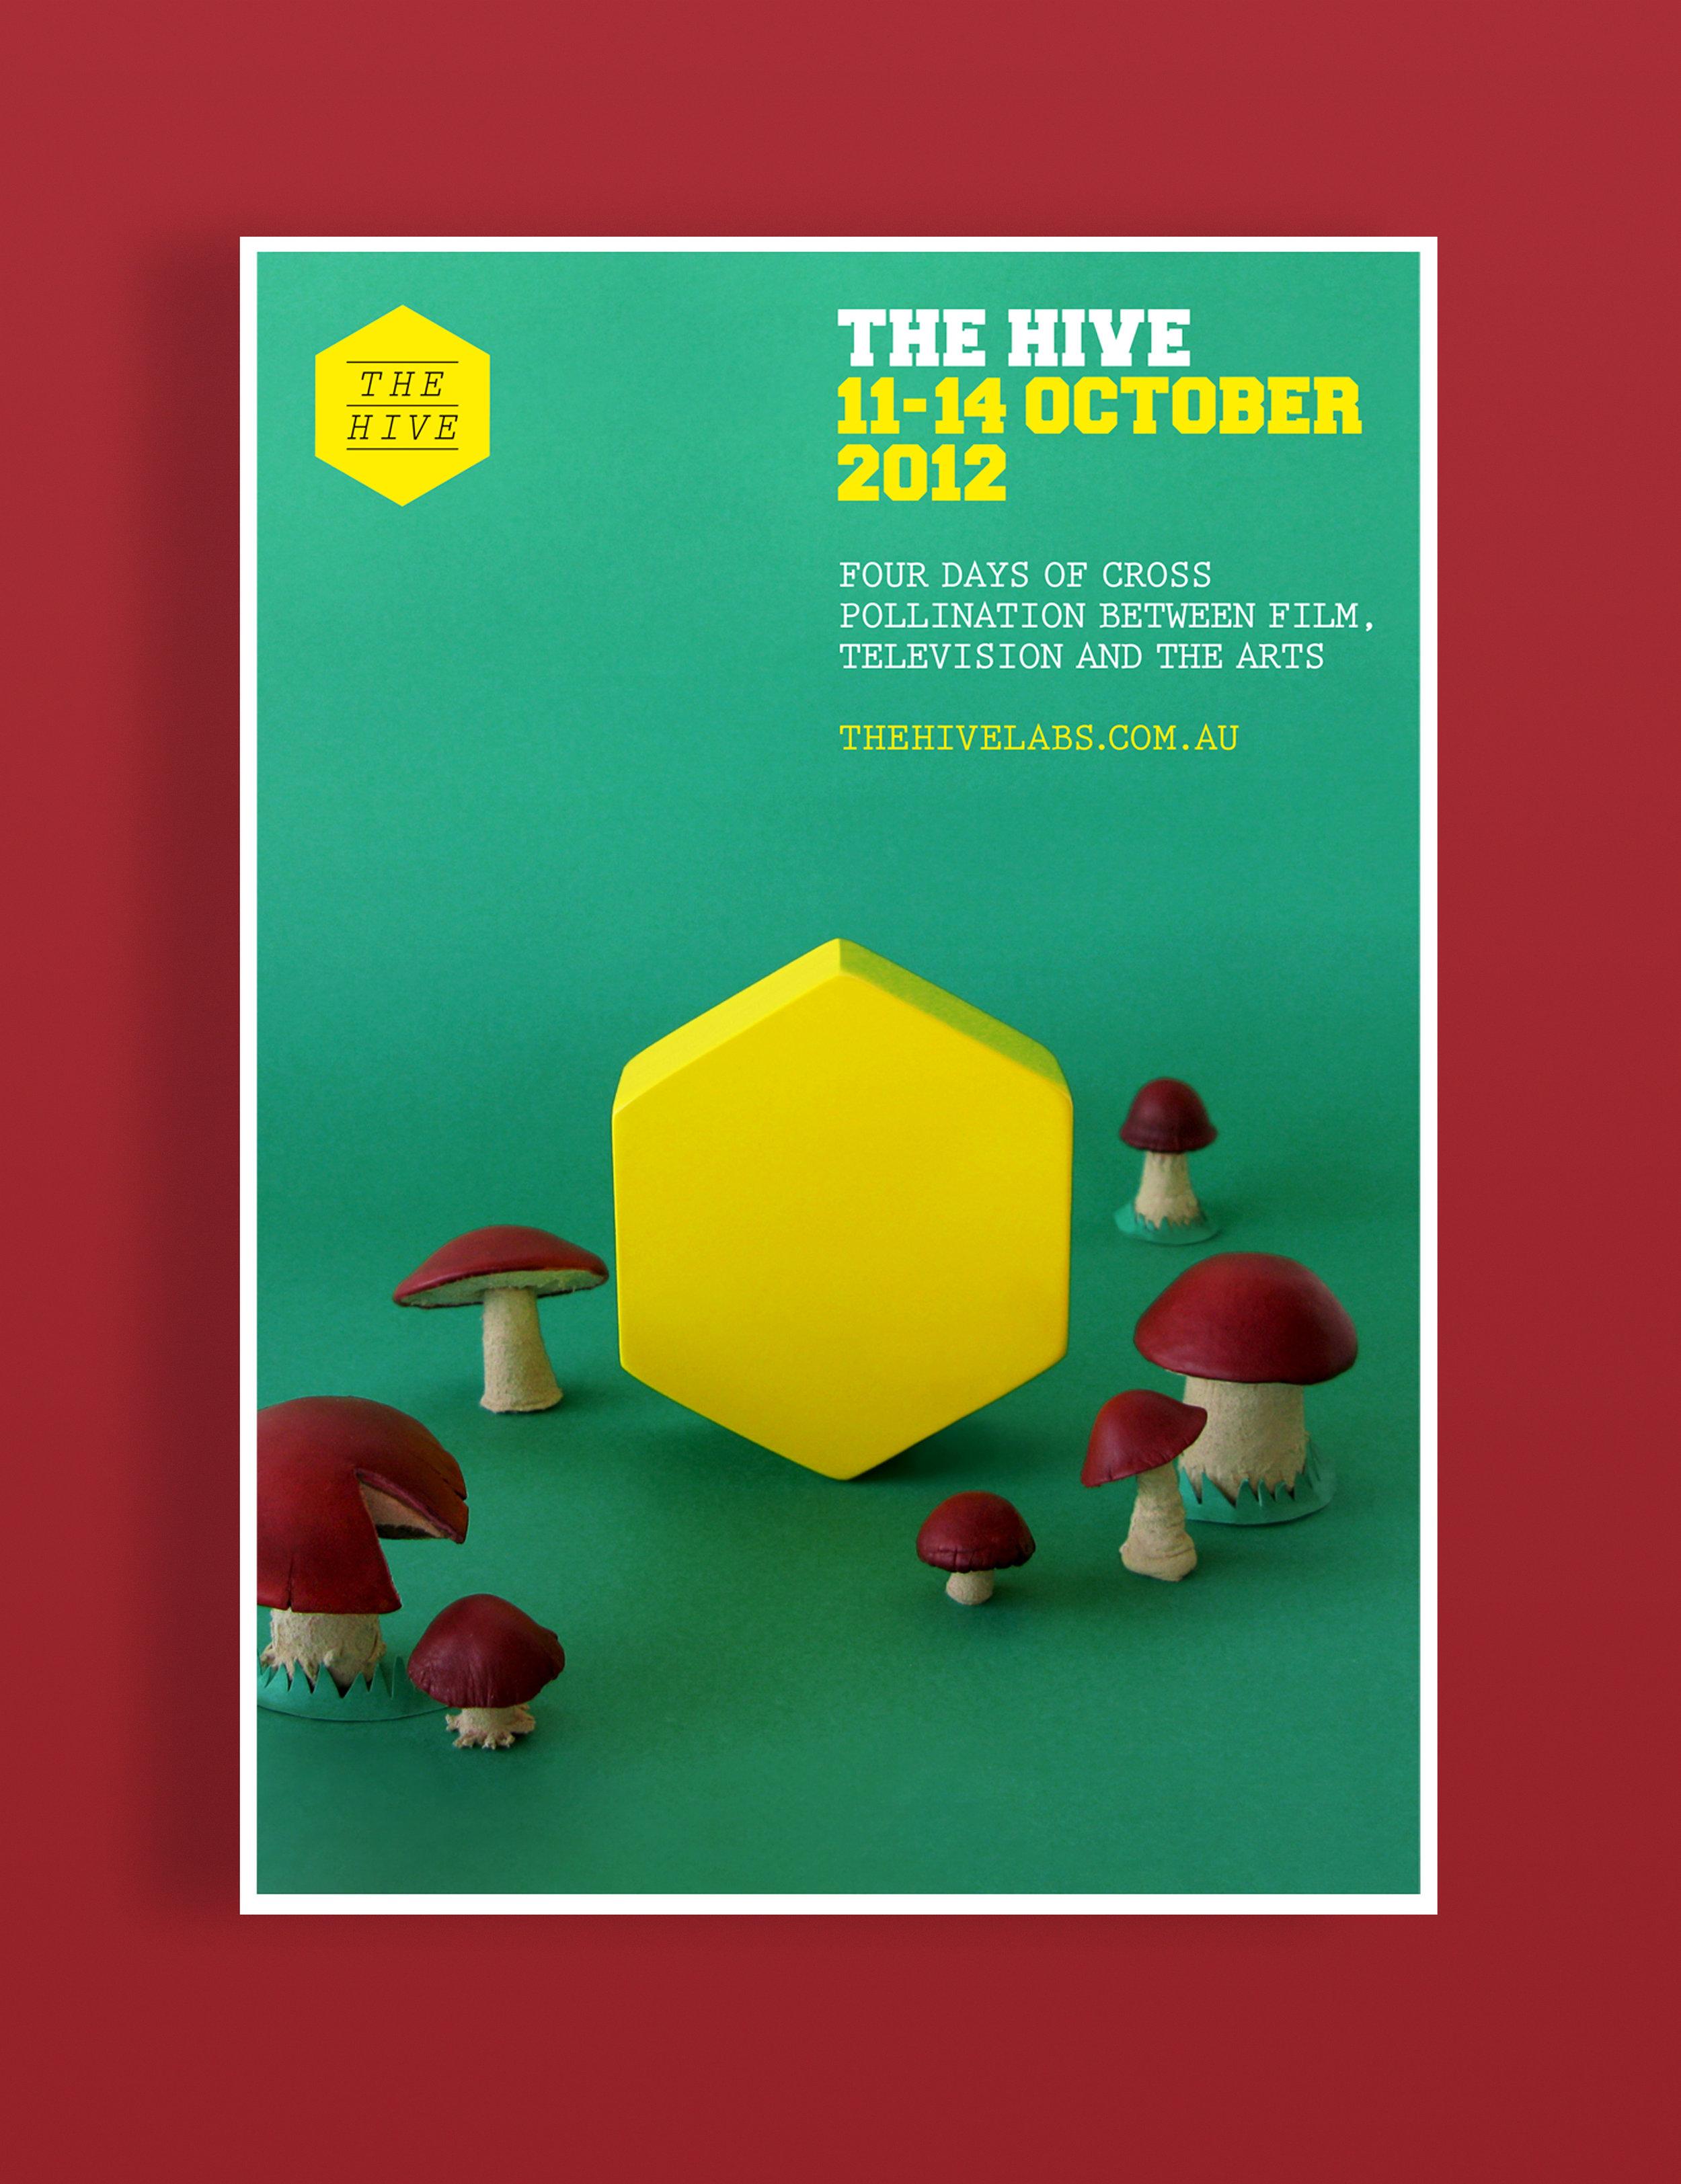 HSITI_The_Hive_Poster_02.jpg